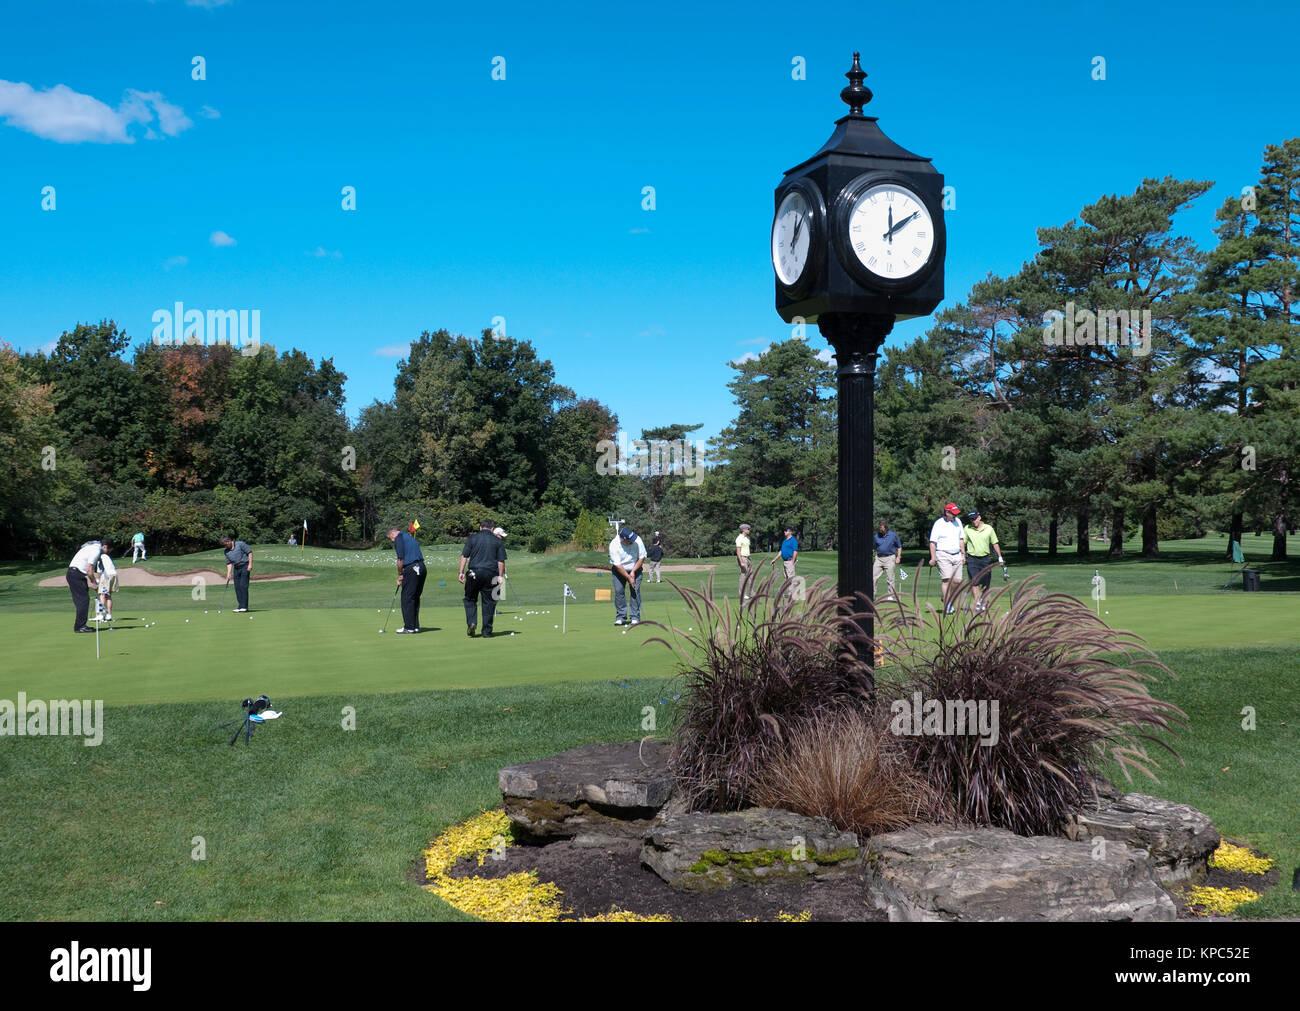 Golf Course Clock Stock Photos \u0026 Golf Course Clock Stock